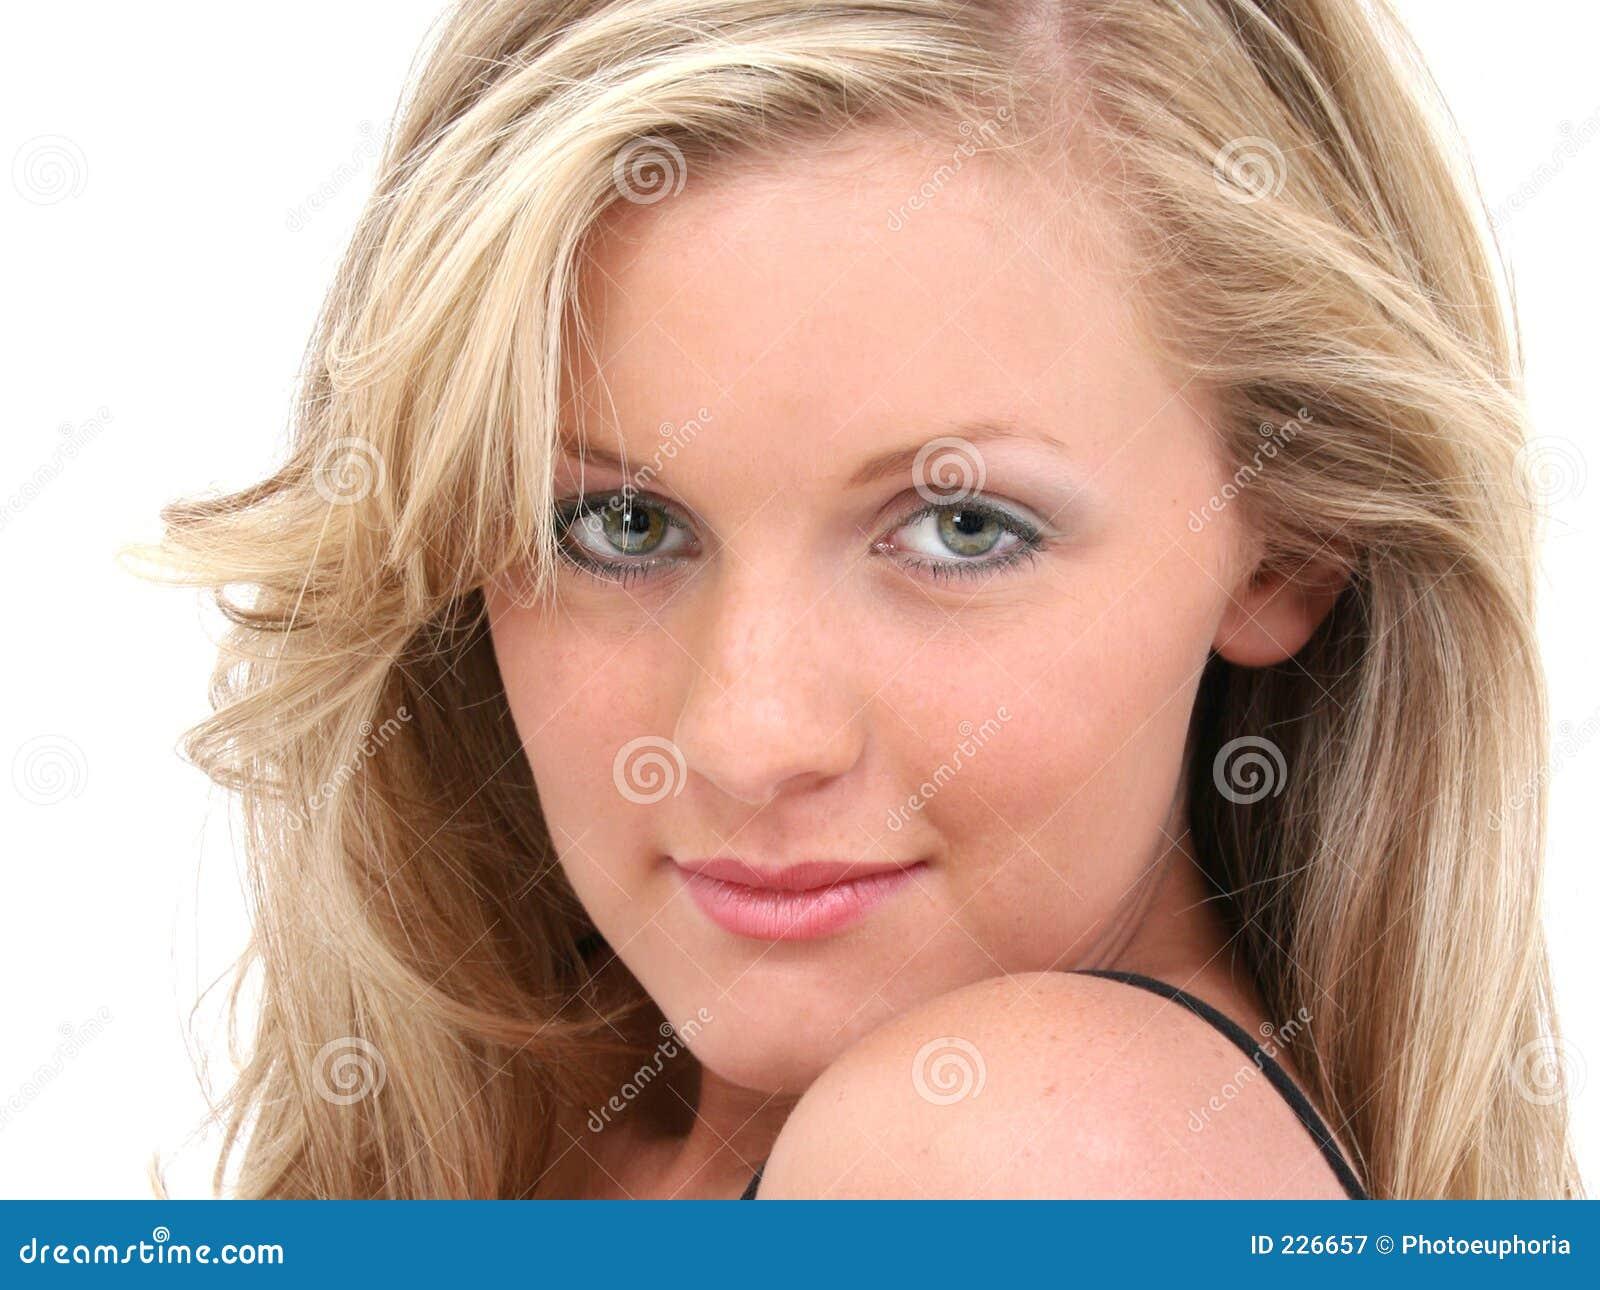 Attractive Teen Girl Blonde Hair Hazel Eyes